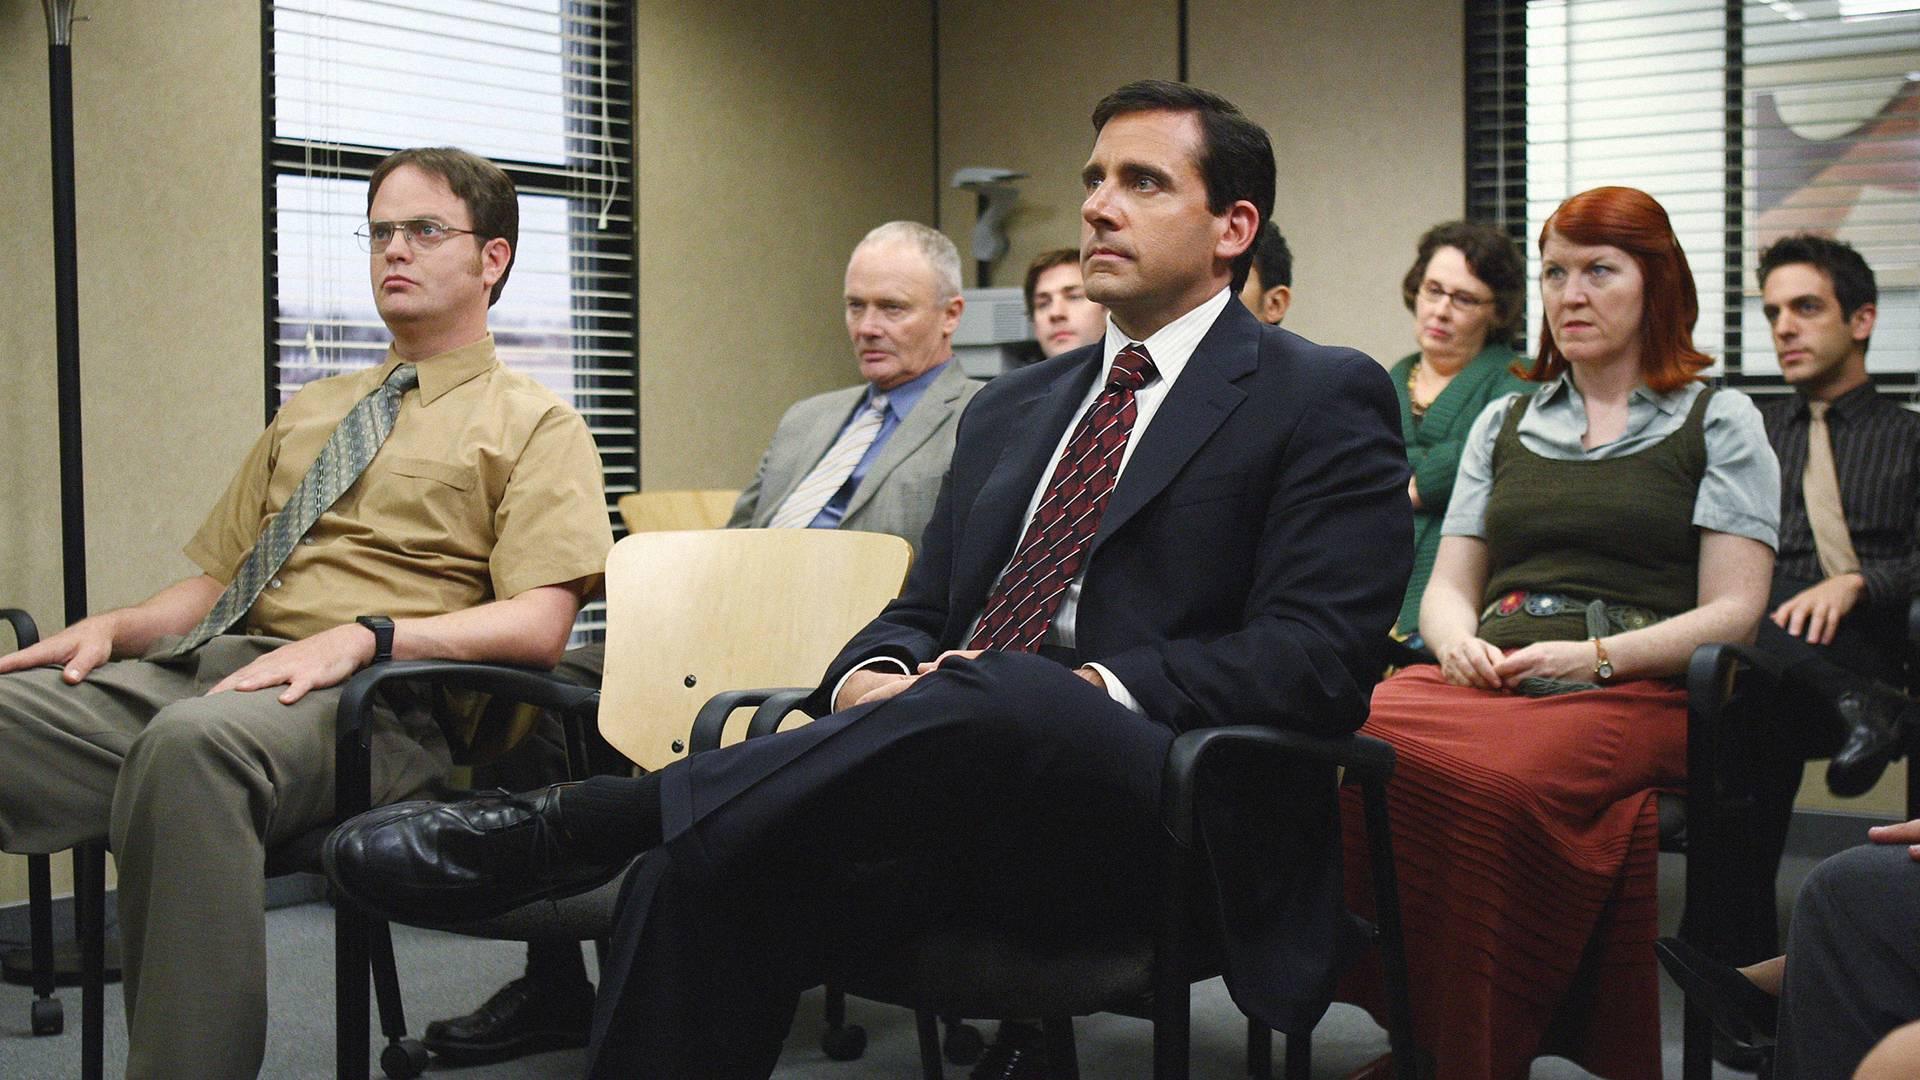 The Office Season 5 Episode 3